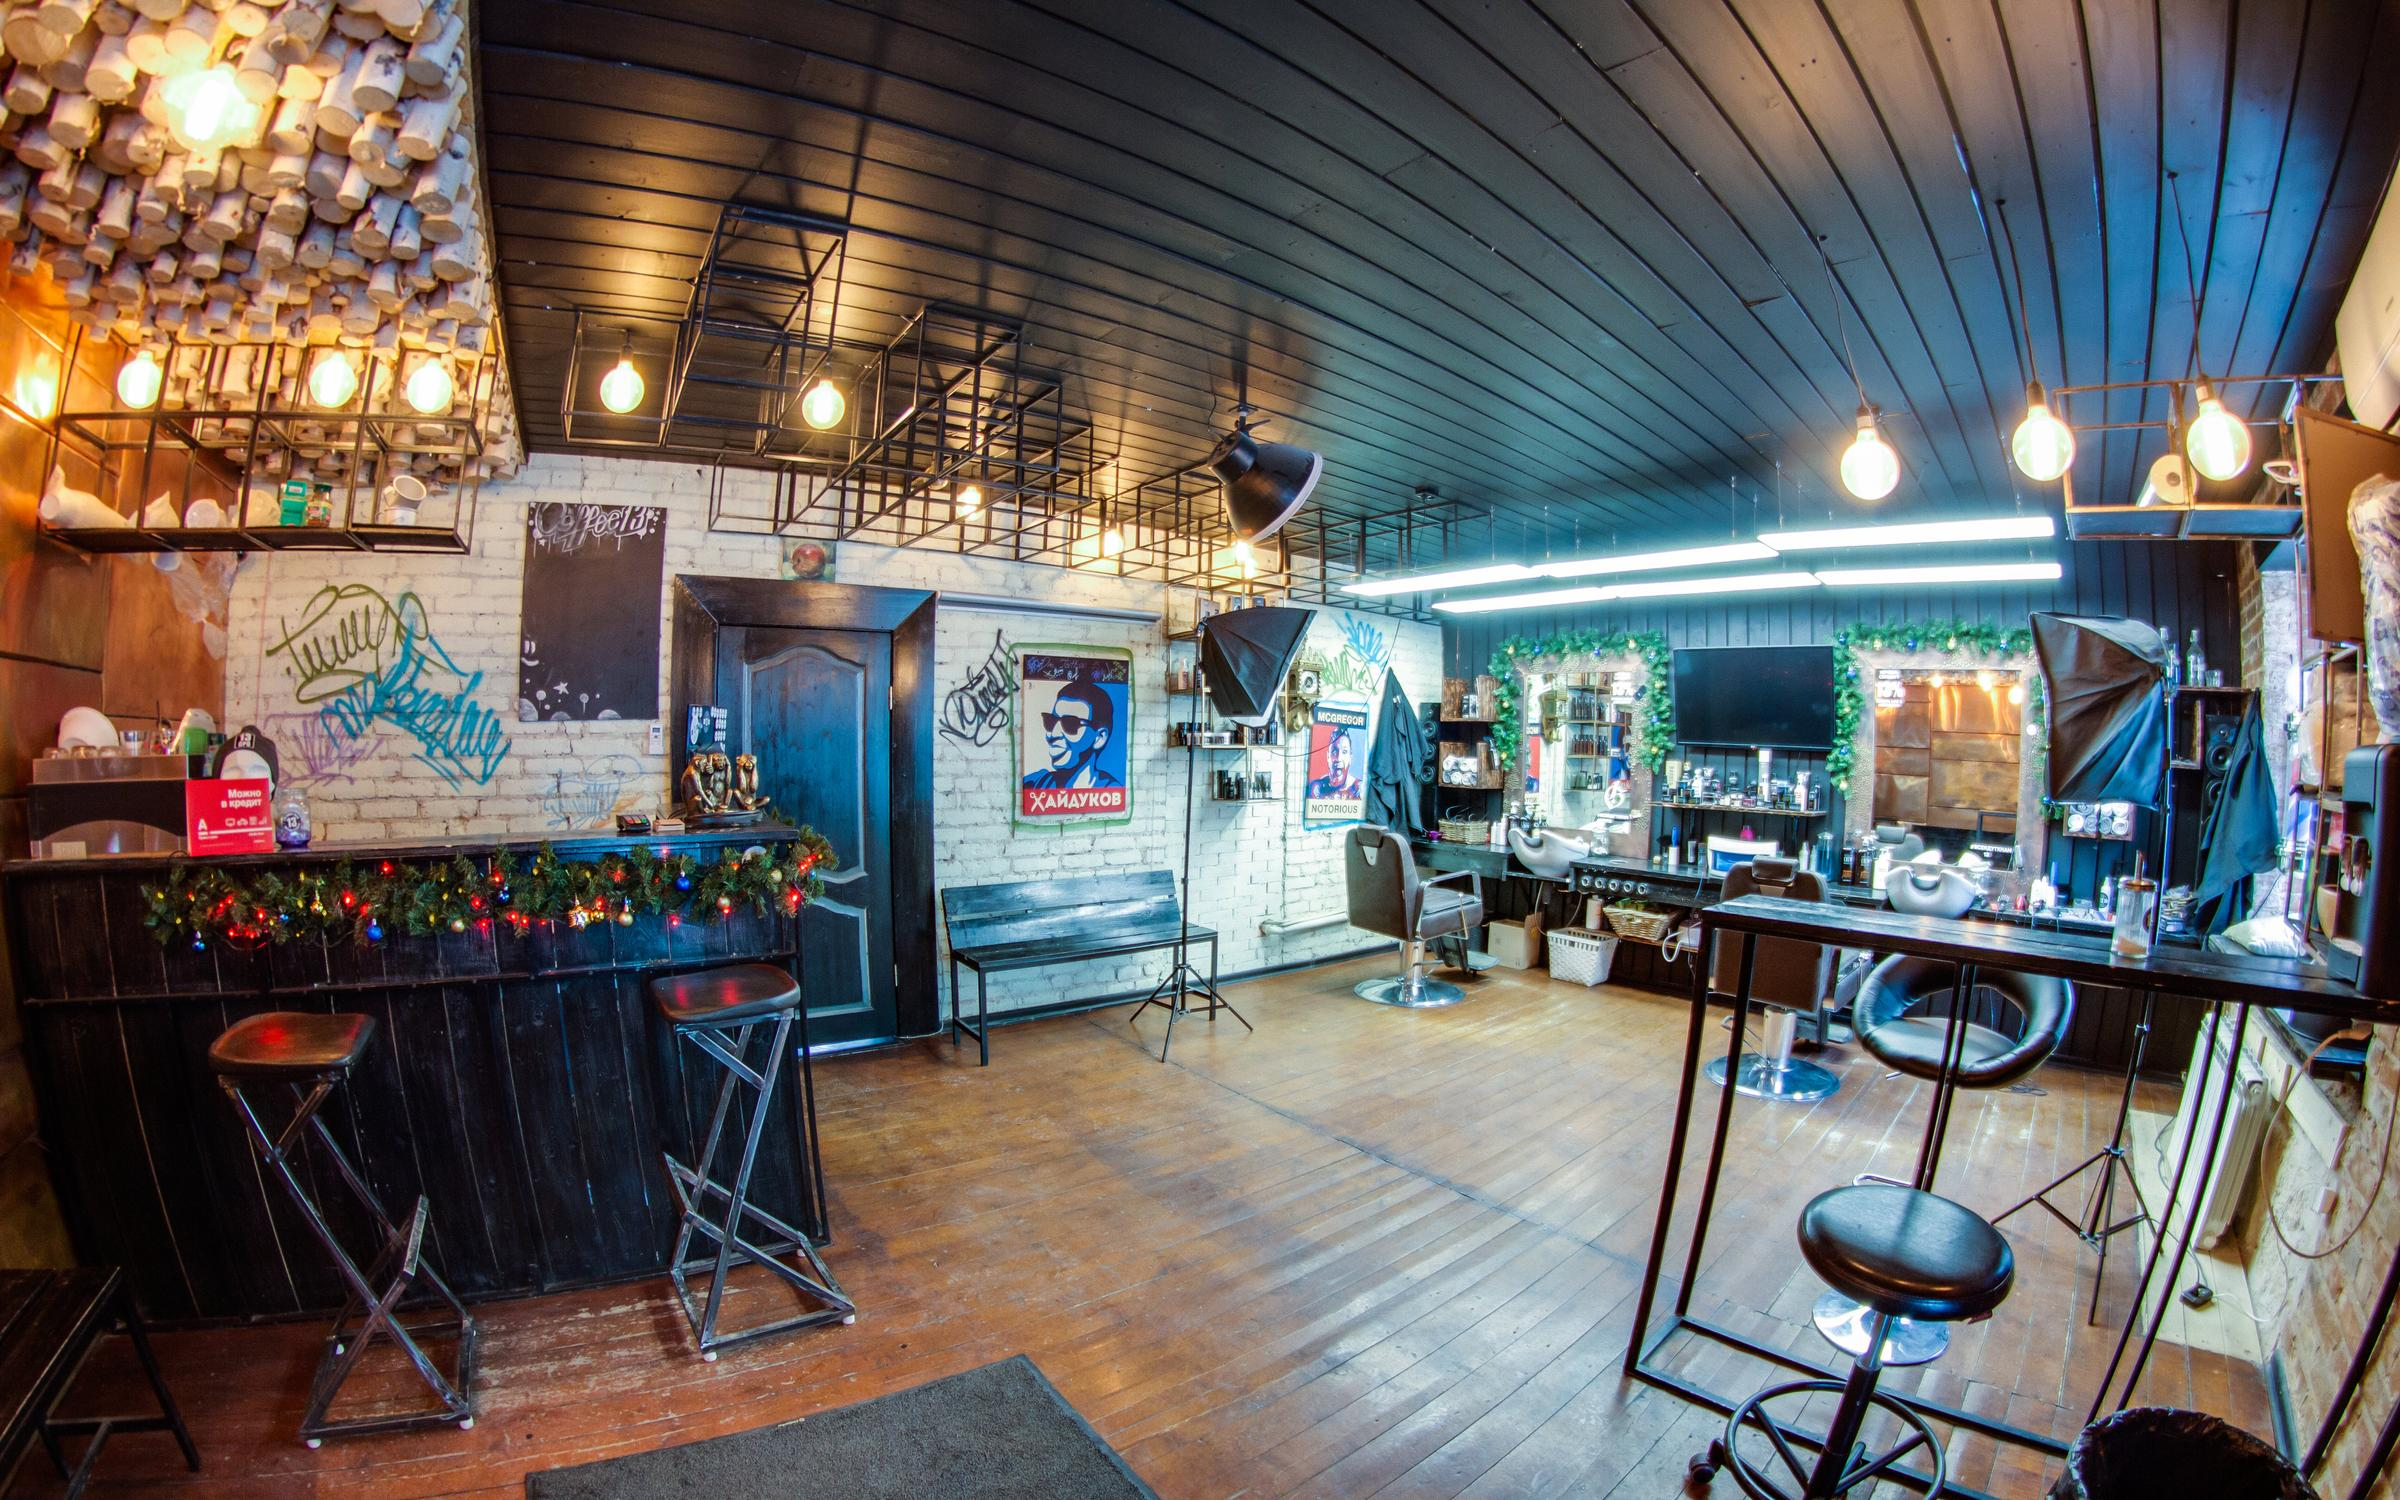 фотография Тату-салона и барбершопа the 13 opg на Полевой улице